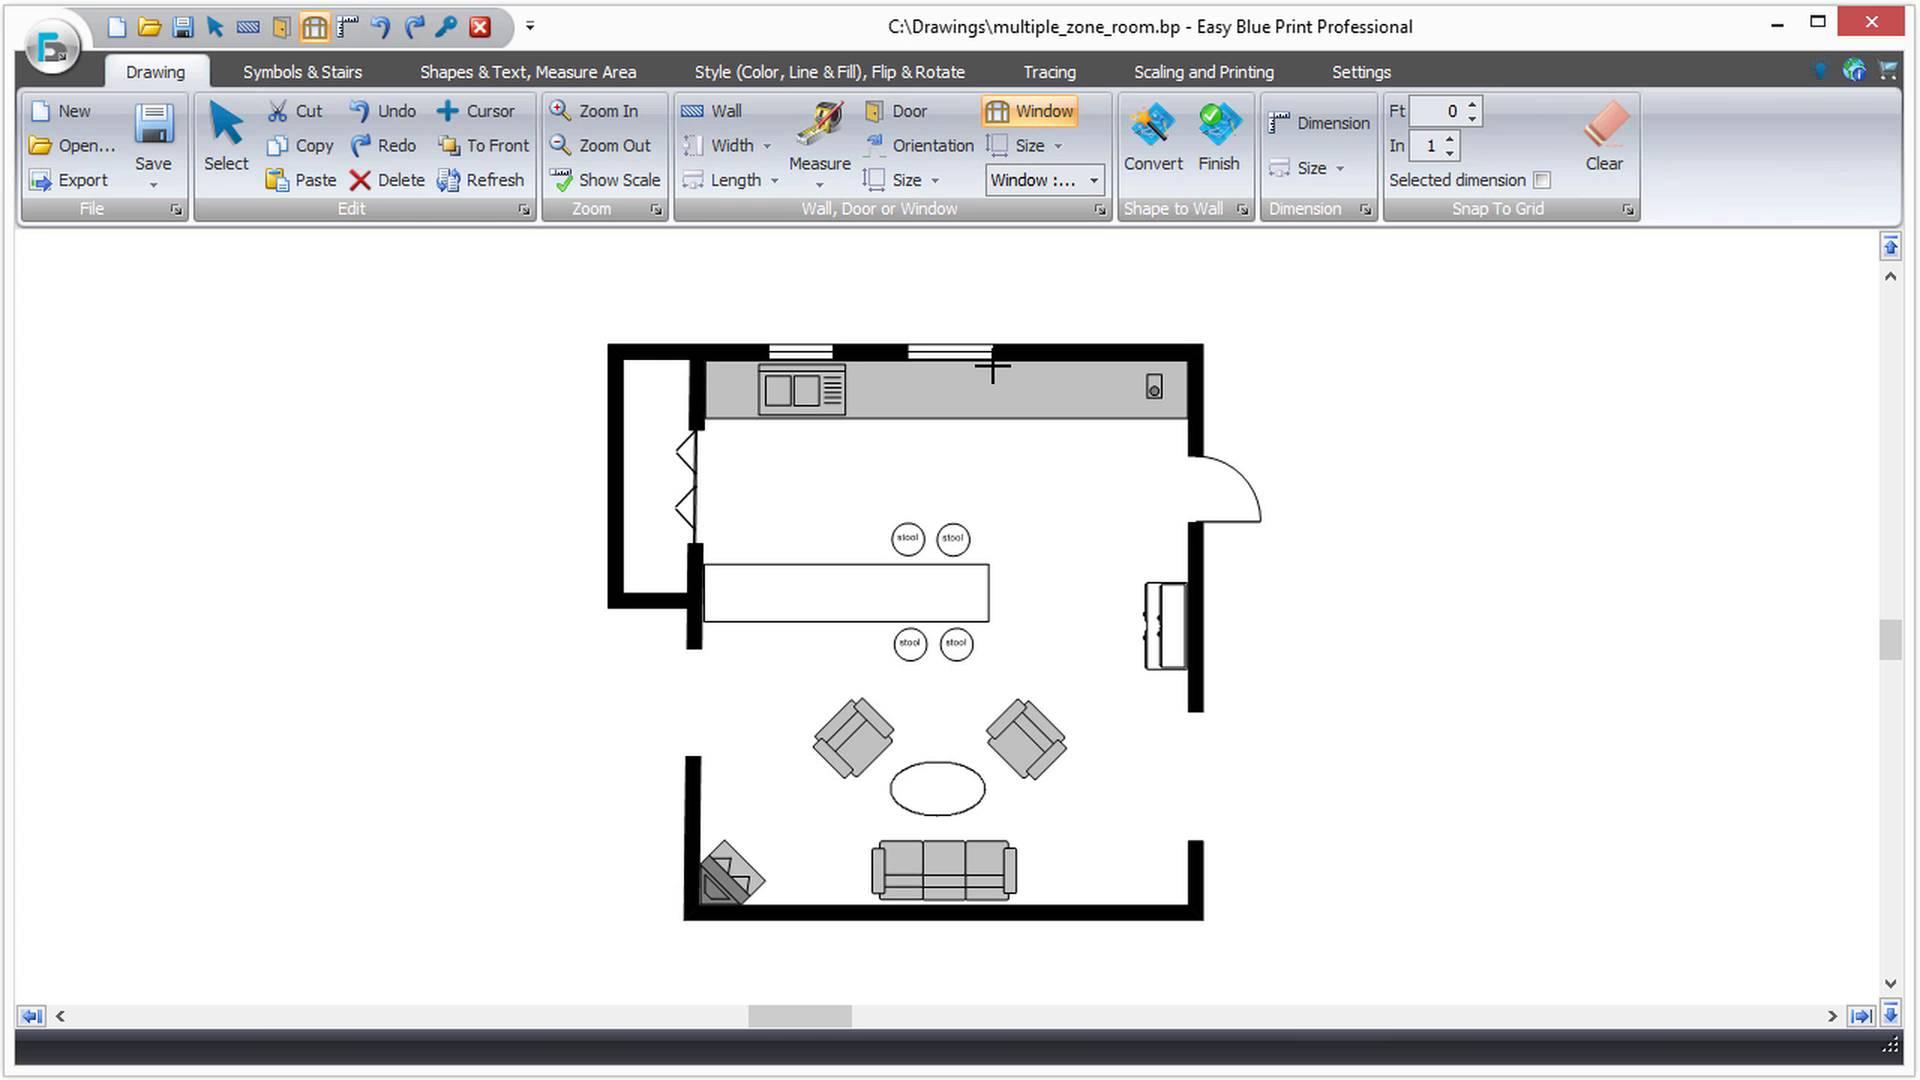 easy to use floor plan drawing software u2022 ezblueprint com room diagram programs [ 1920 x 1080 Pixel ]